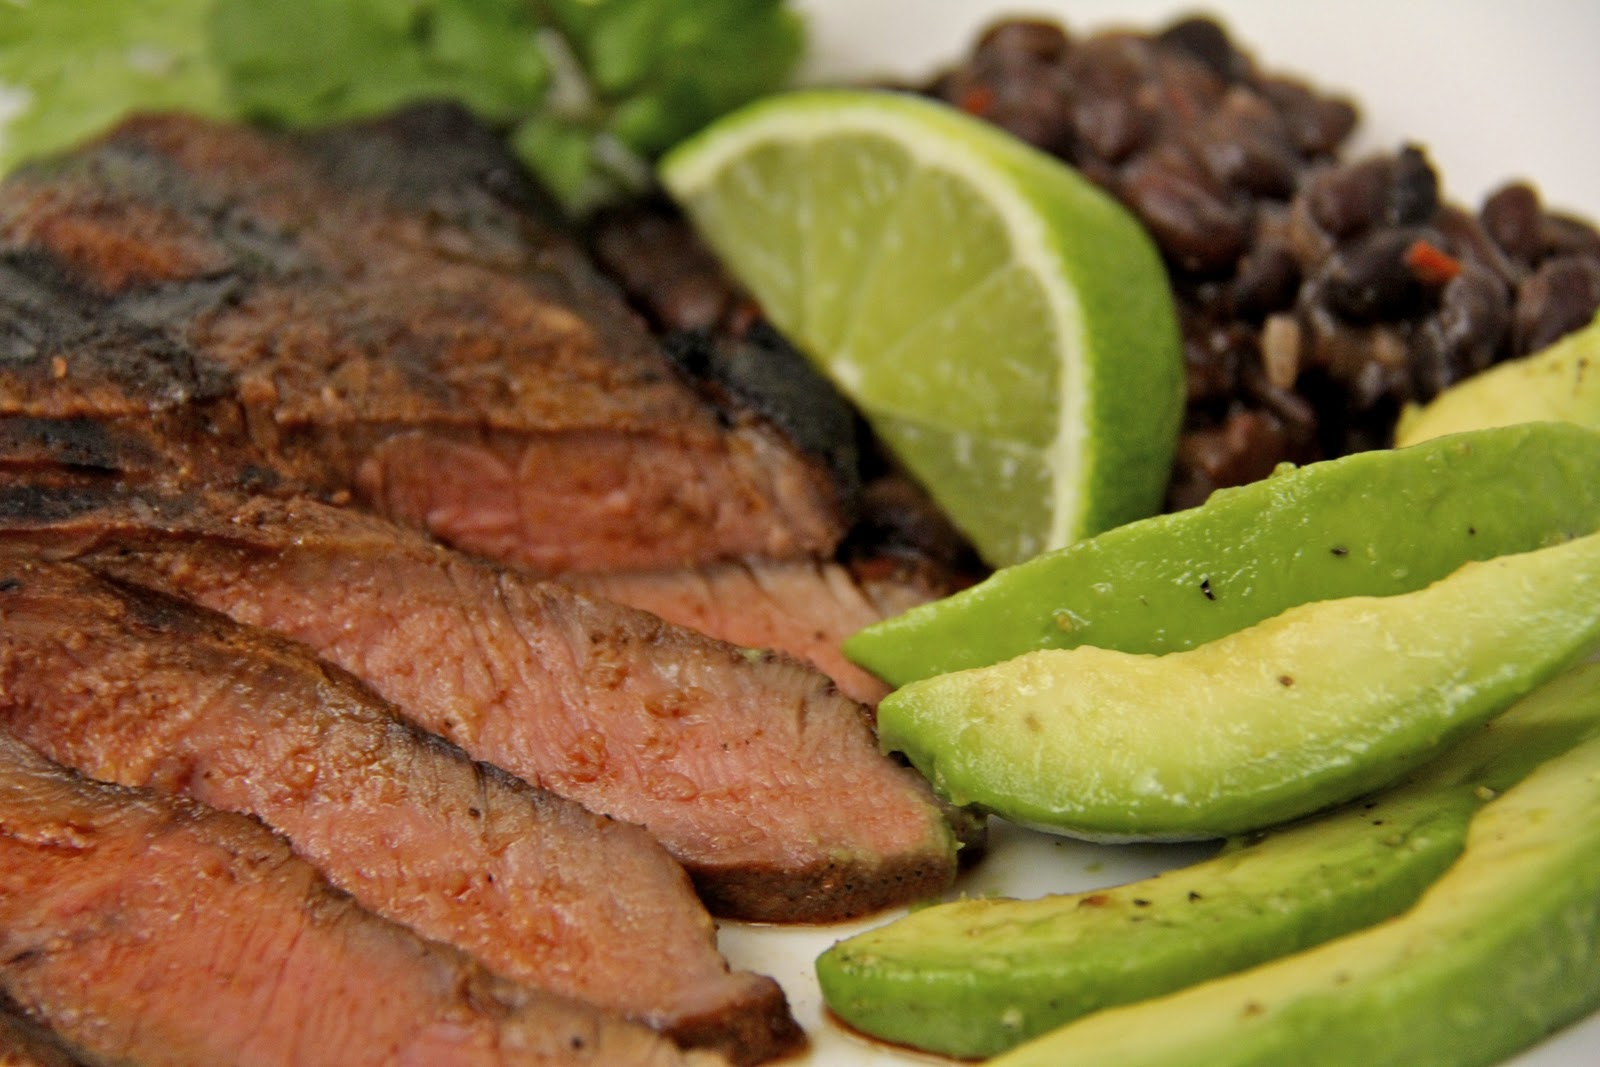 sirloin carne asada burrito taqueria style tacos carne asada chipotle ...